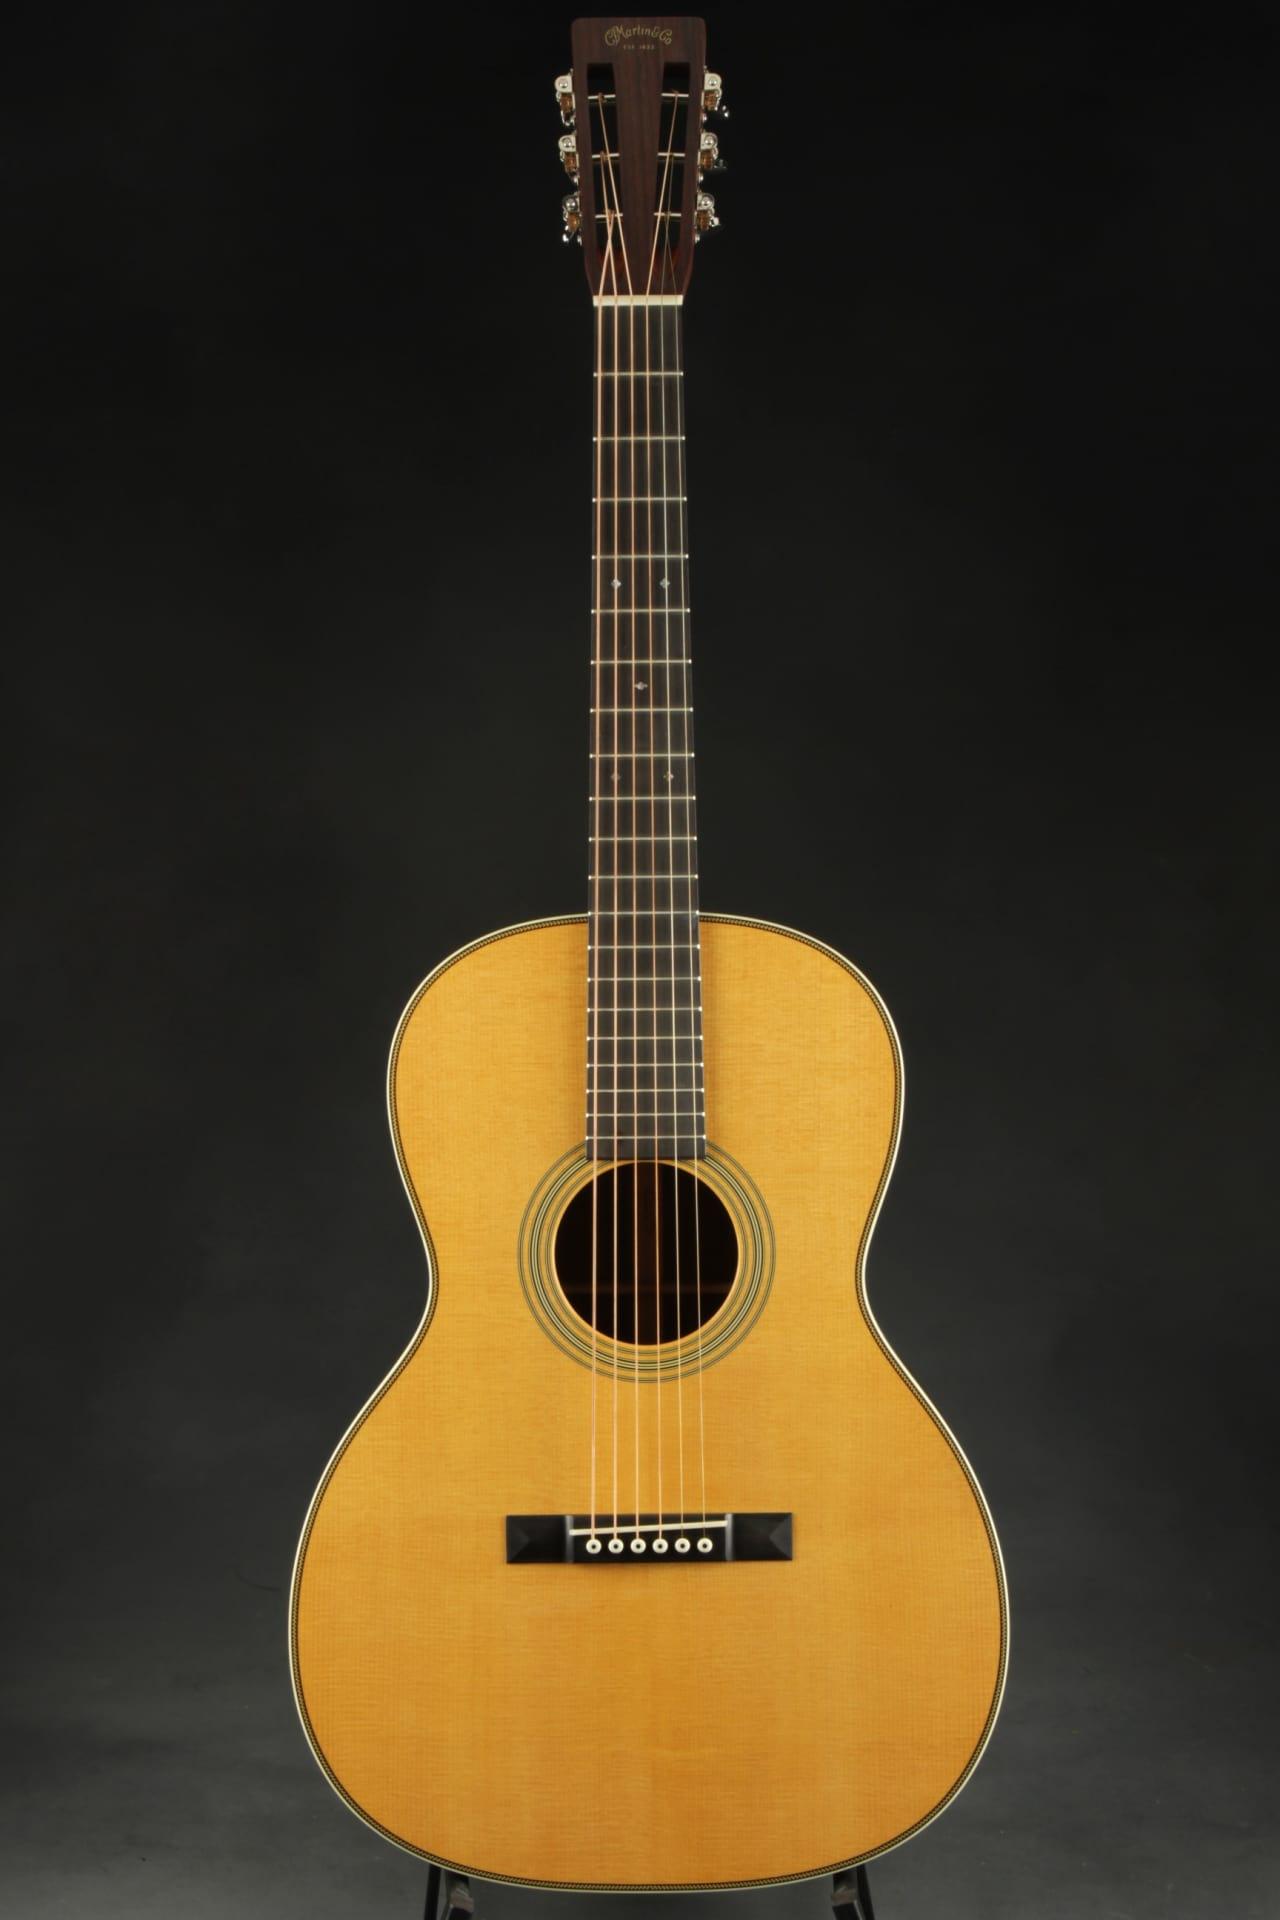 martin 000 28vs eddie 39 s guitars reverb. Black Bedroom Furniture Sets. Home Design Ideas